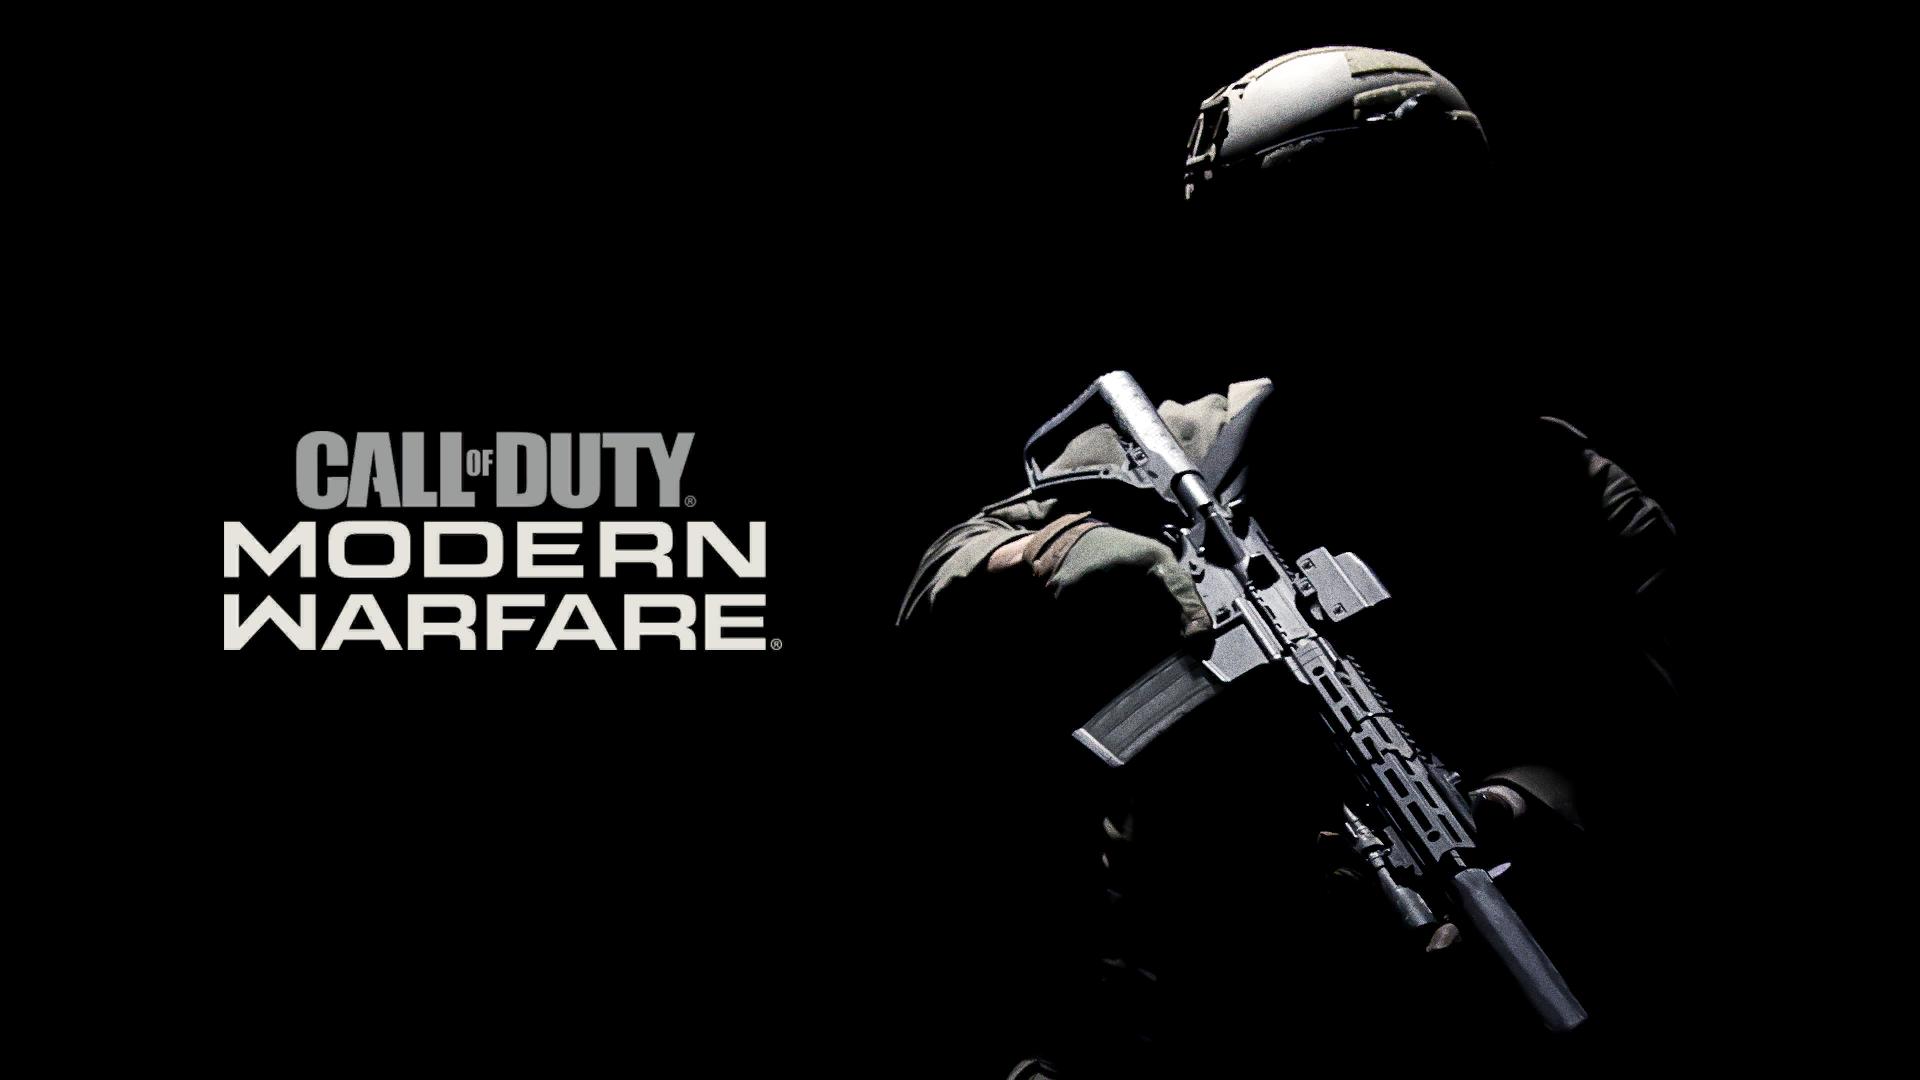 Full Call of Duty Modern Warfare